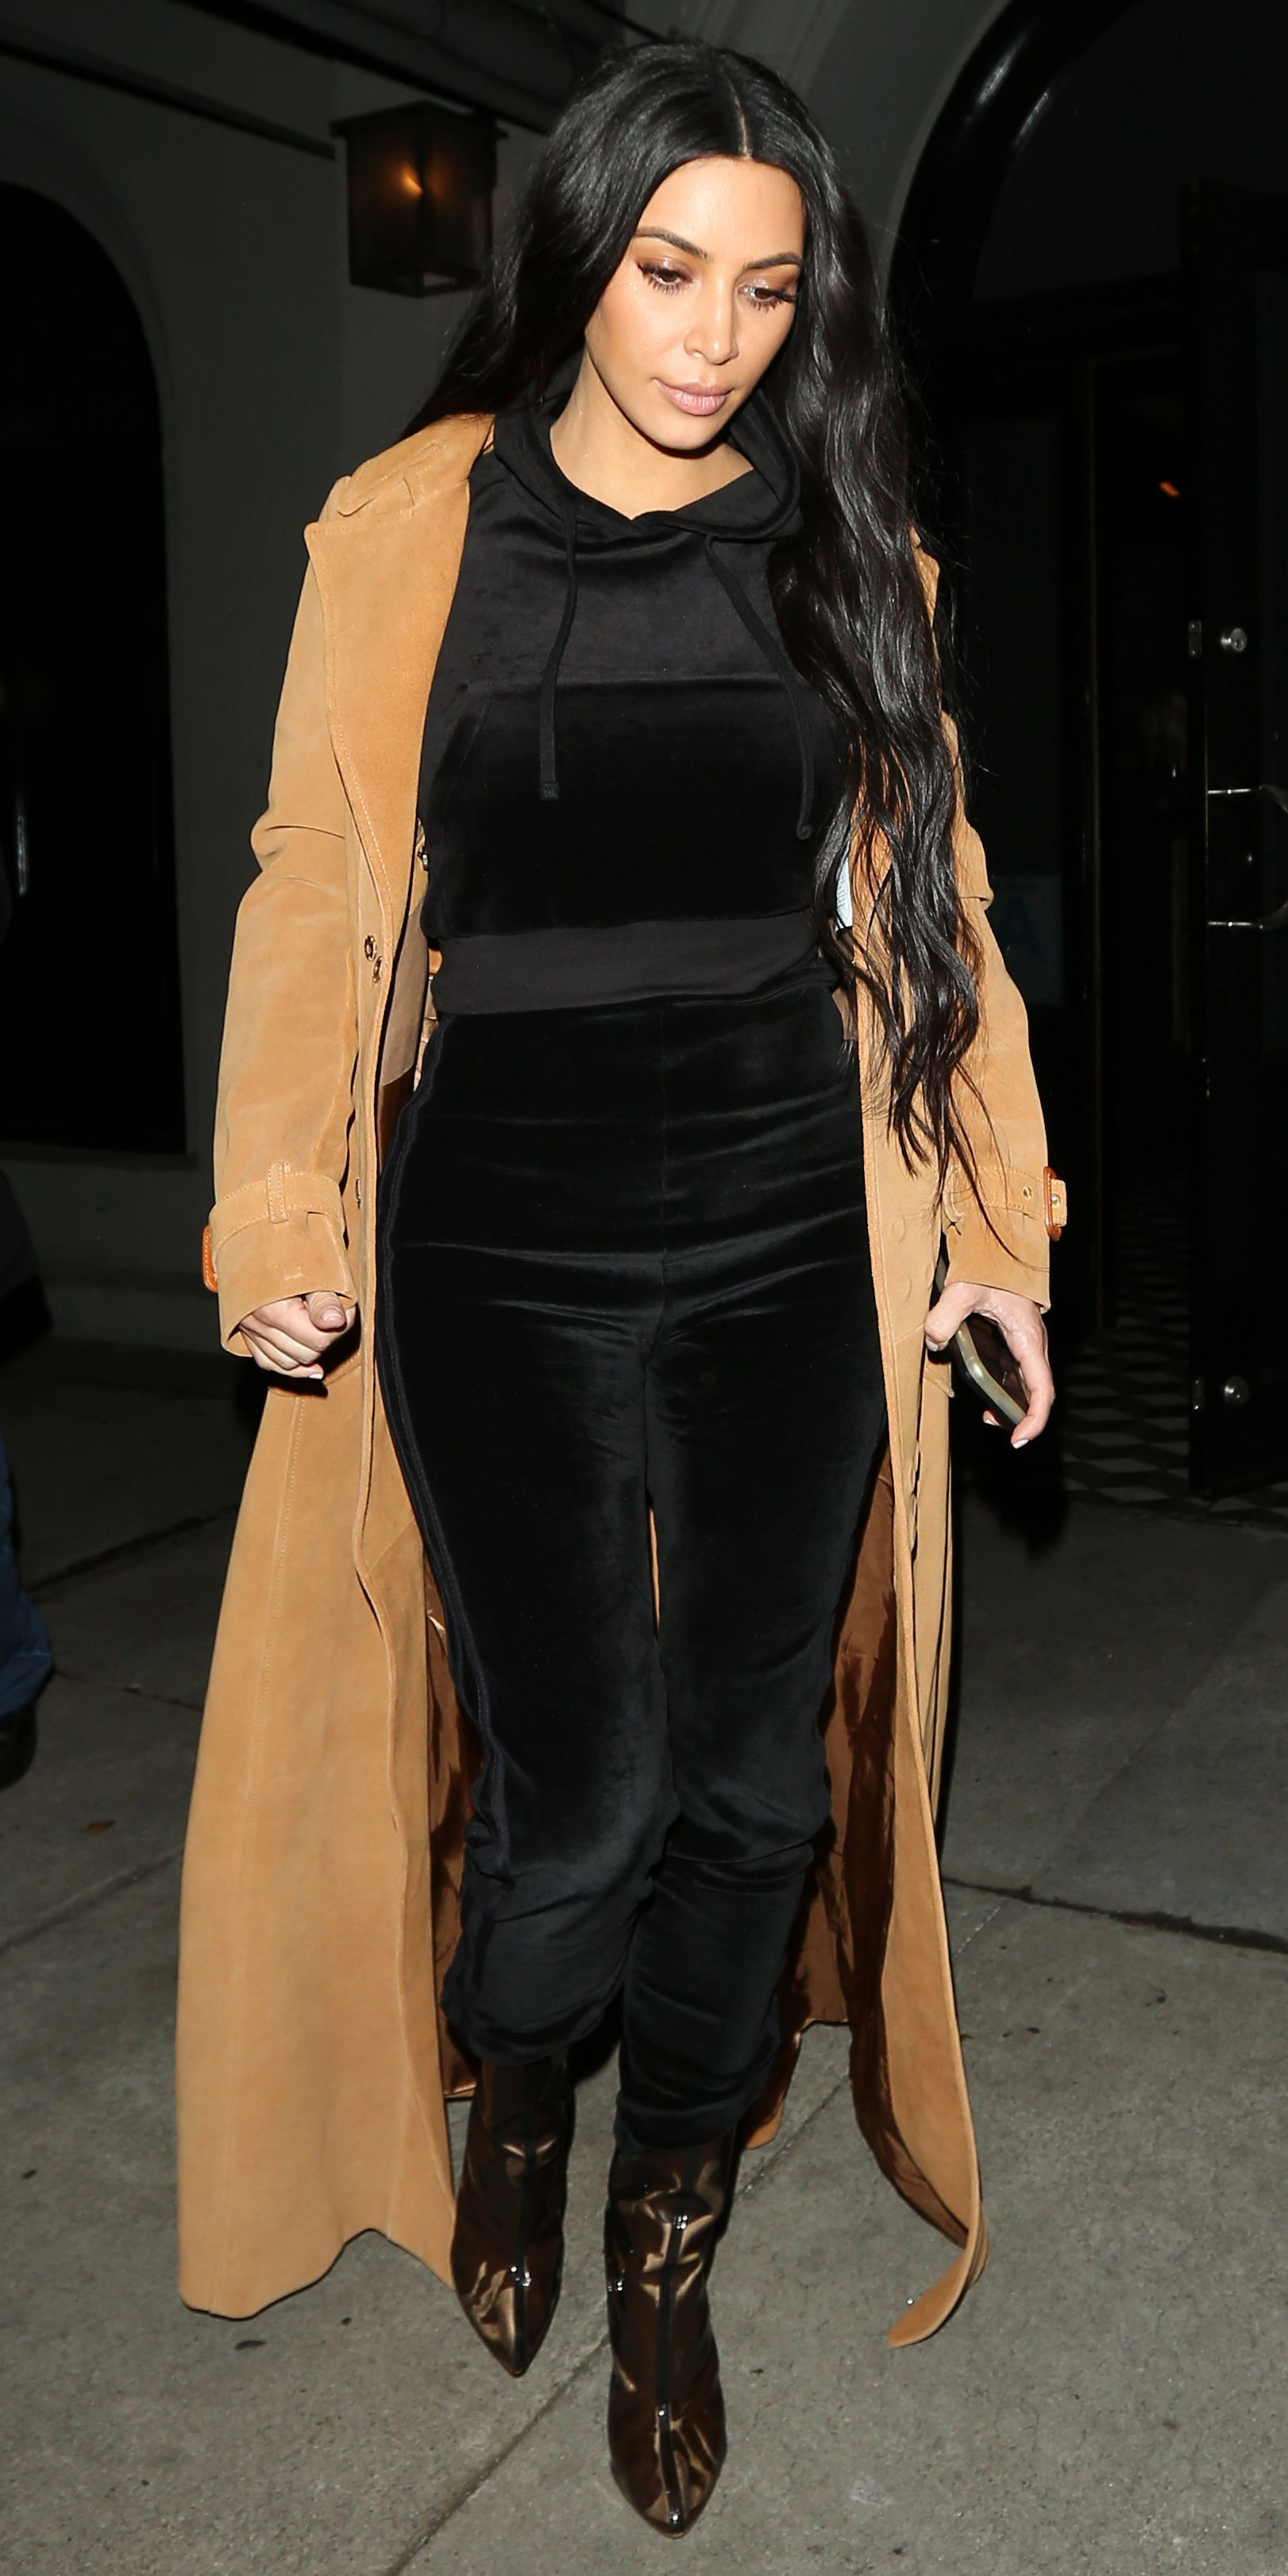 e03e170f451ec Kim Kardashian West s Best Street Style Moments - February 6